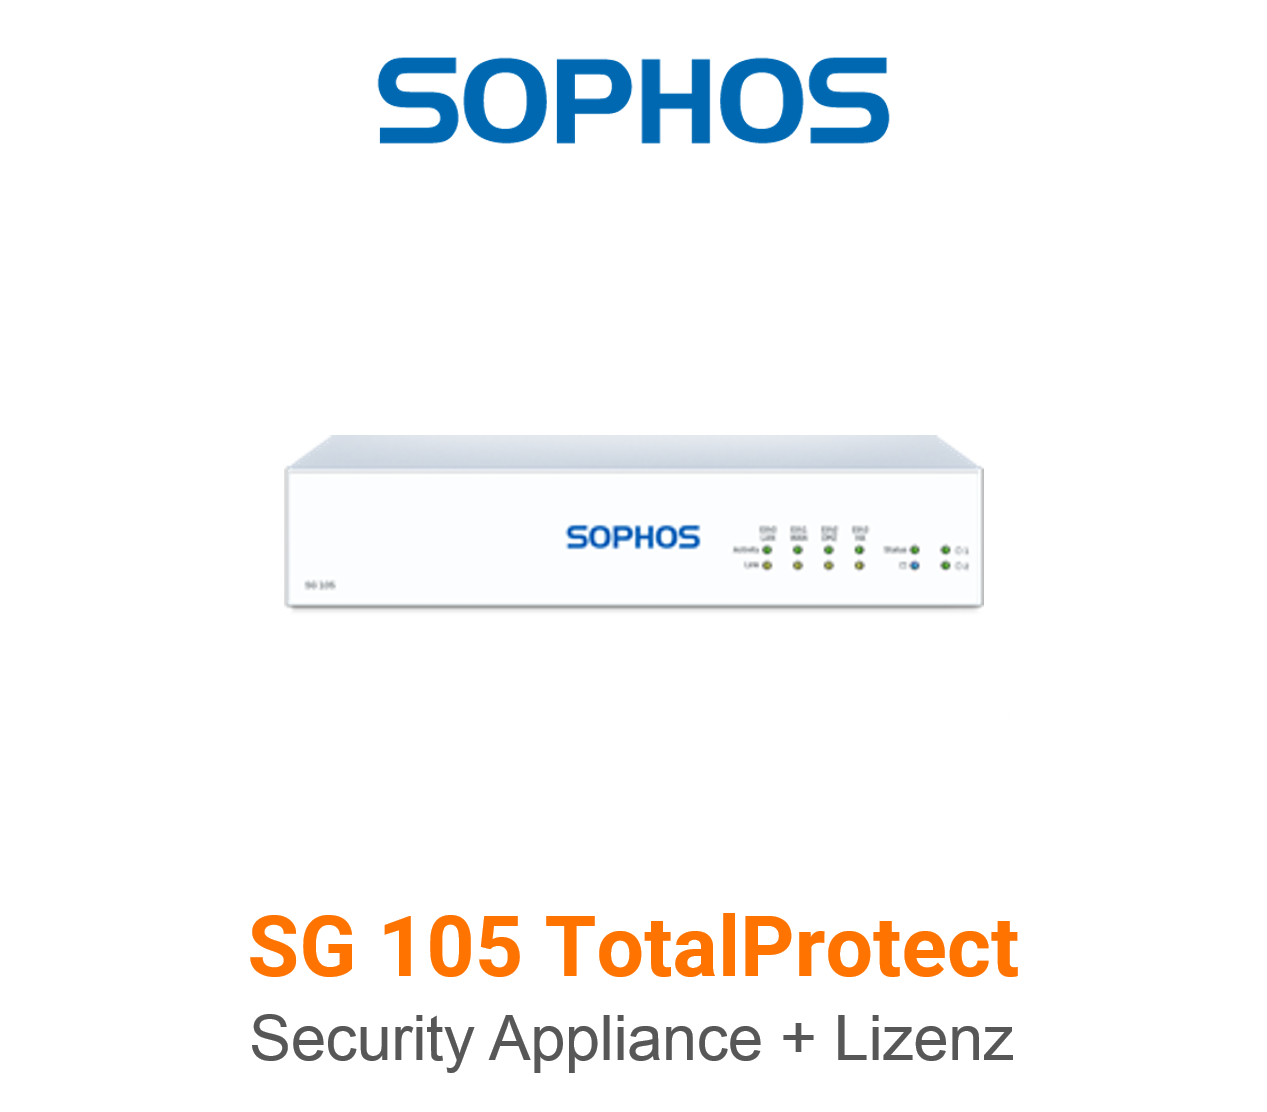 Sophos SG 105 TotalProtect Bundle (Hardware + Lizenz)